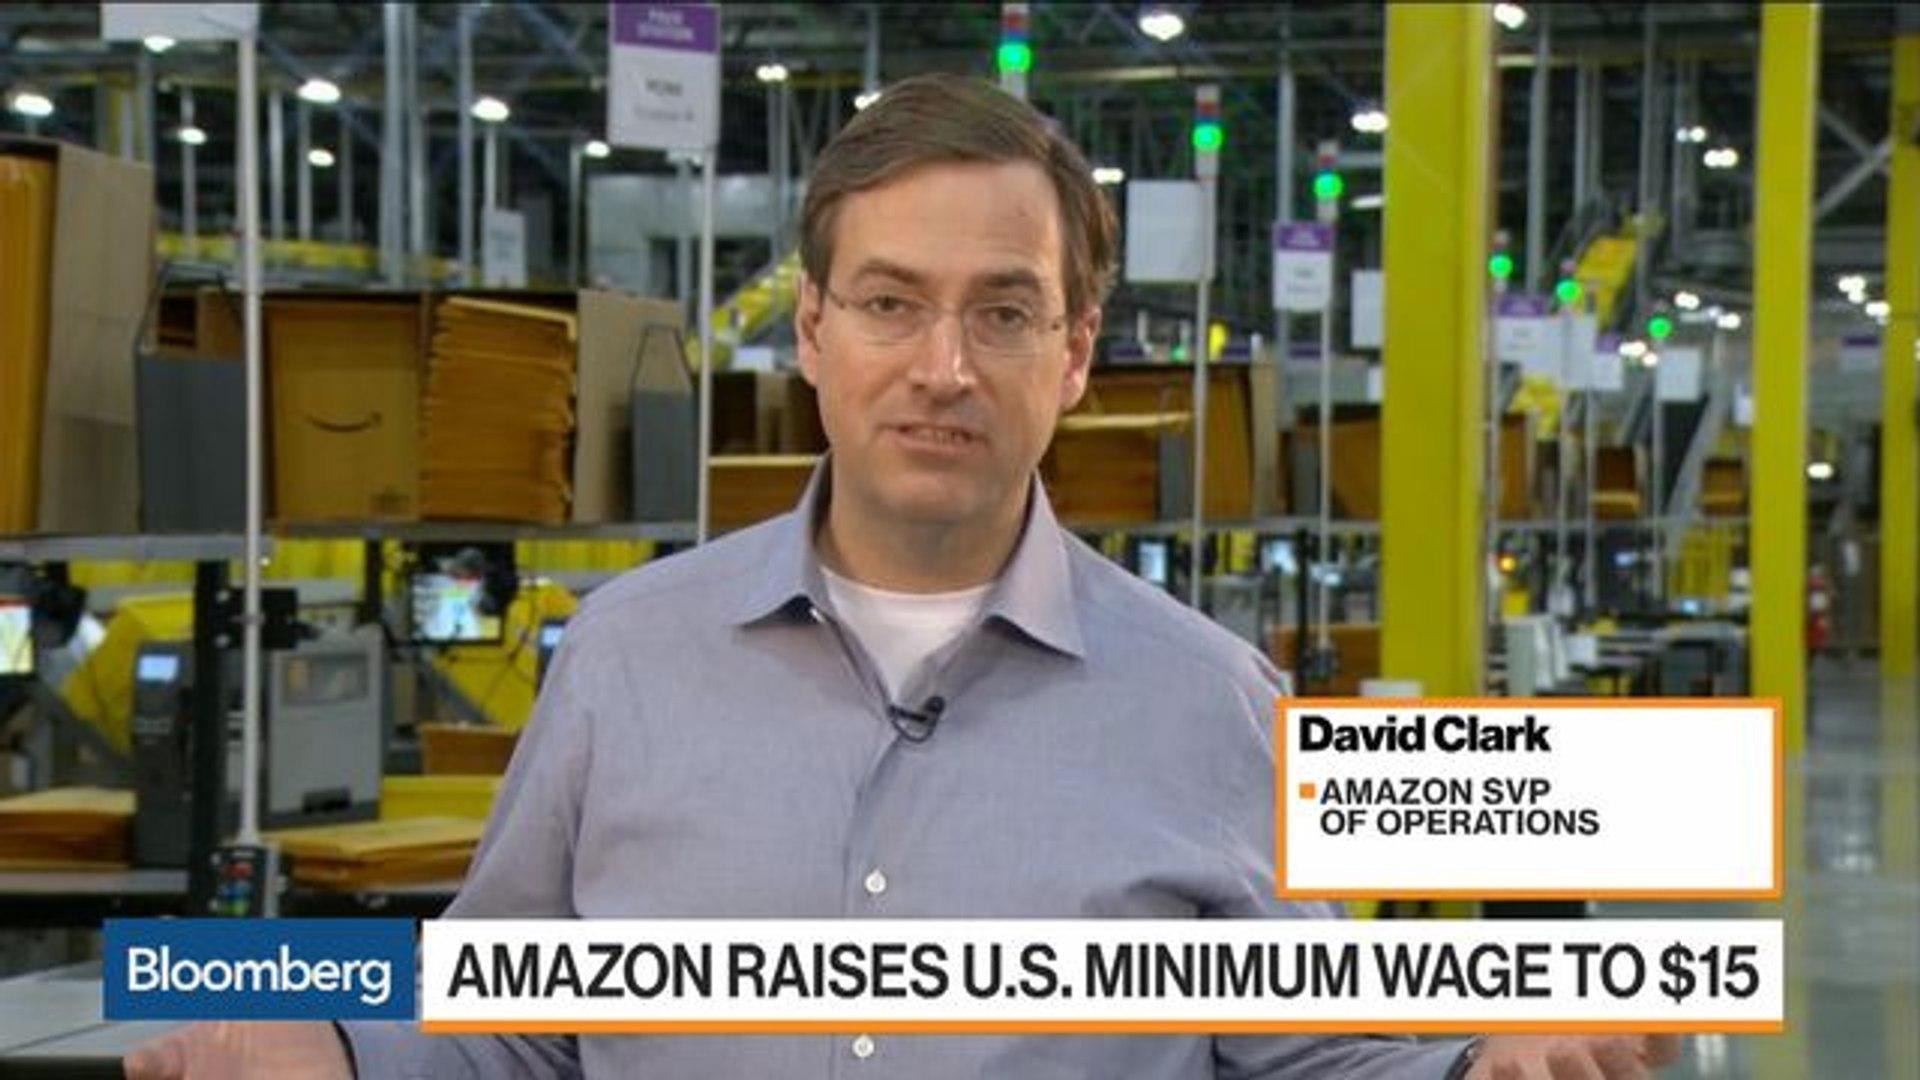 Amazon SVP Says Raising Minimum Wage Is About the Future